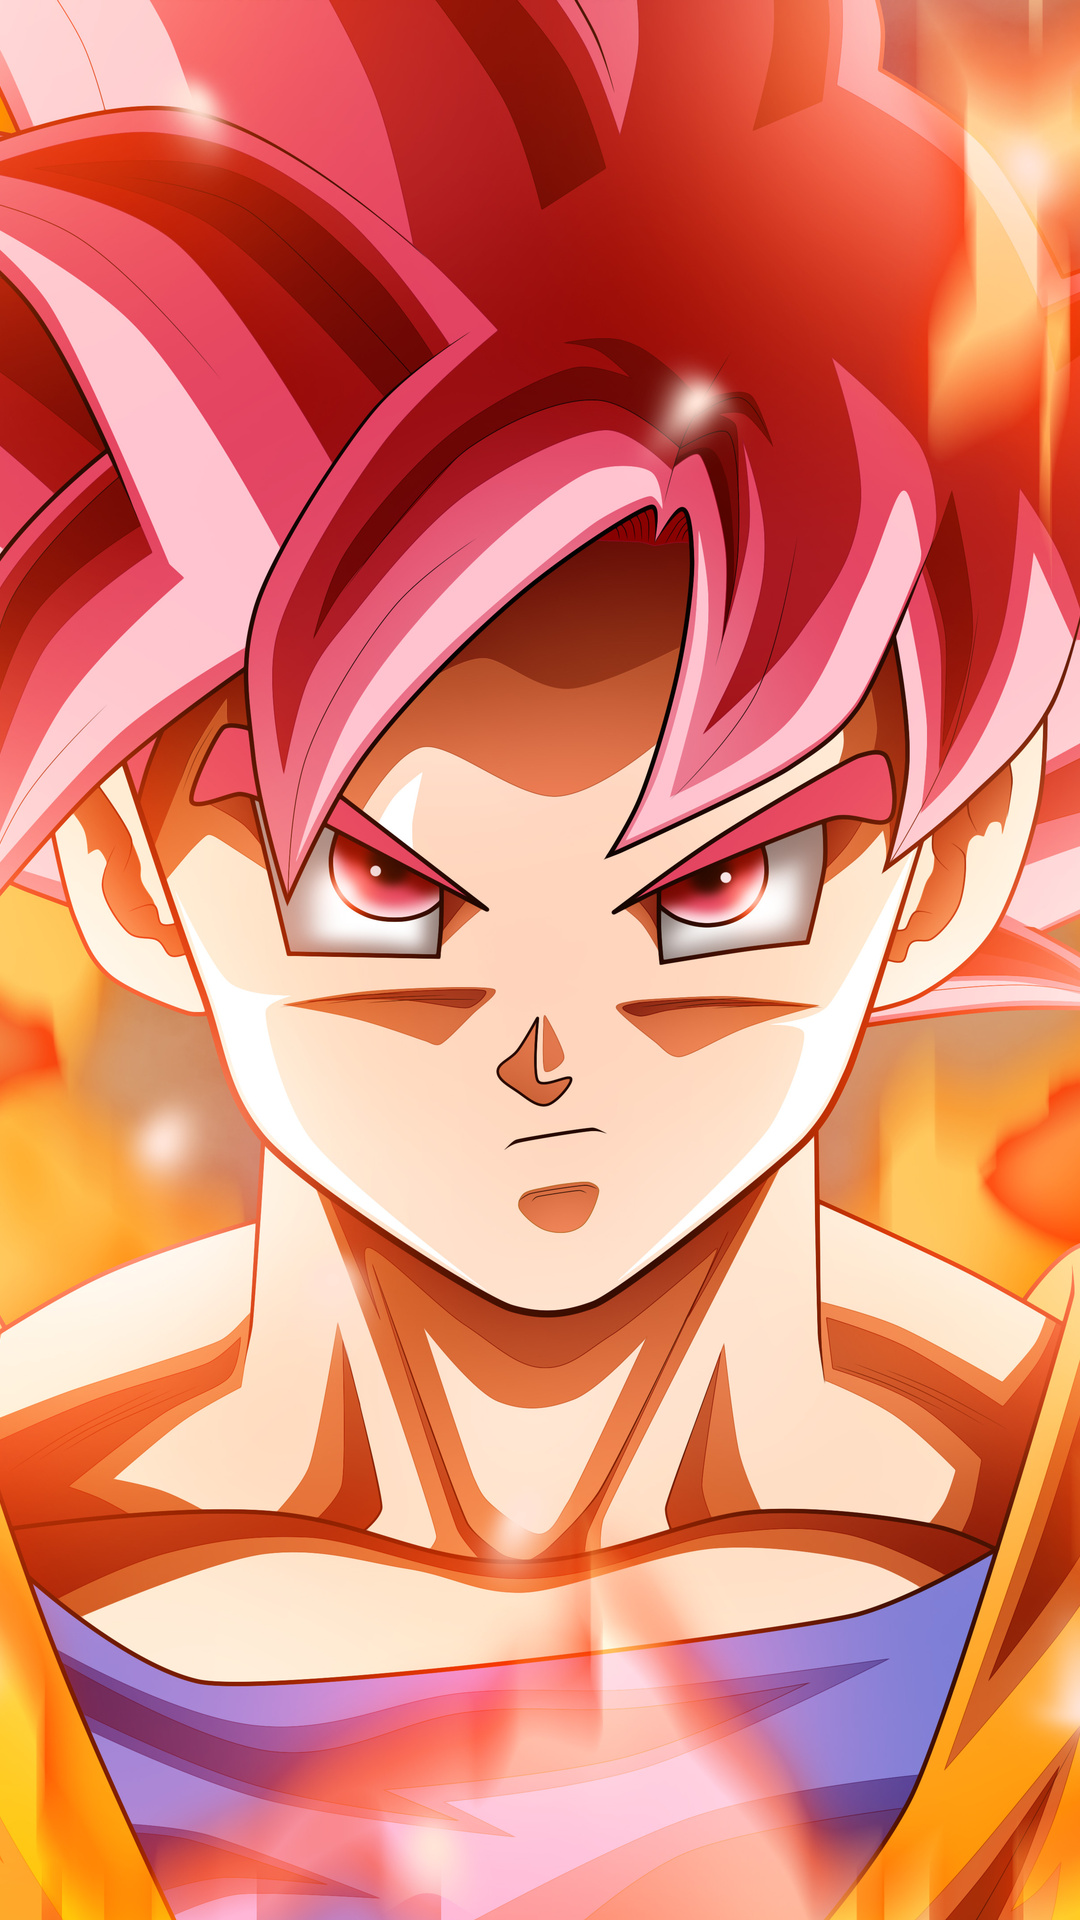 1080x1920 8k Goku Dragon Ball Super Iphone 7,6s,6 Plus, Pixel xl ,One Plus 3,3t,5 HD 4k